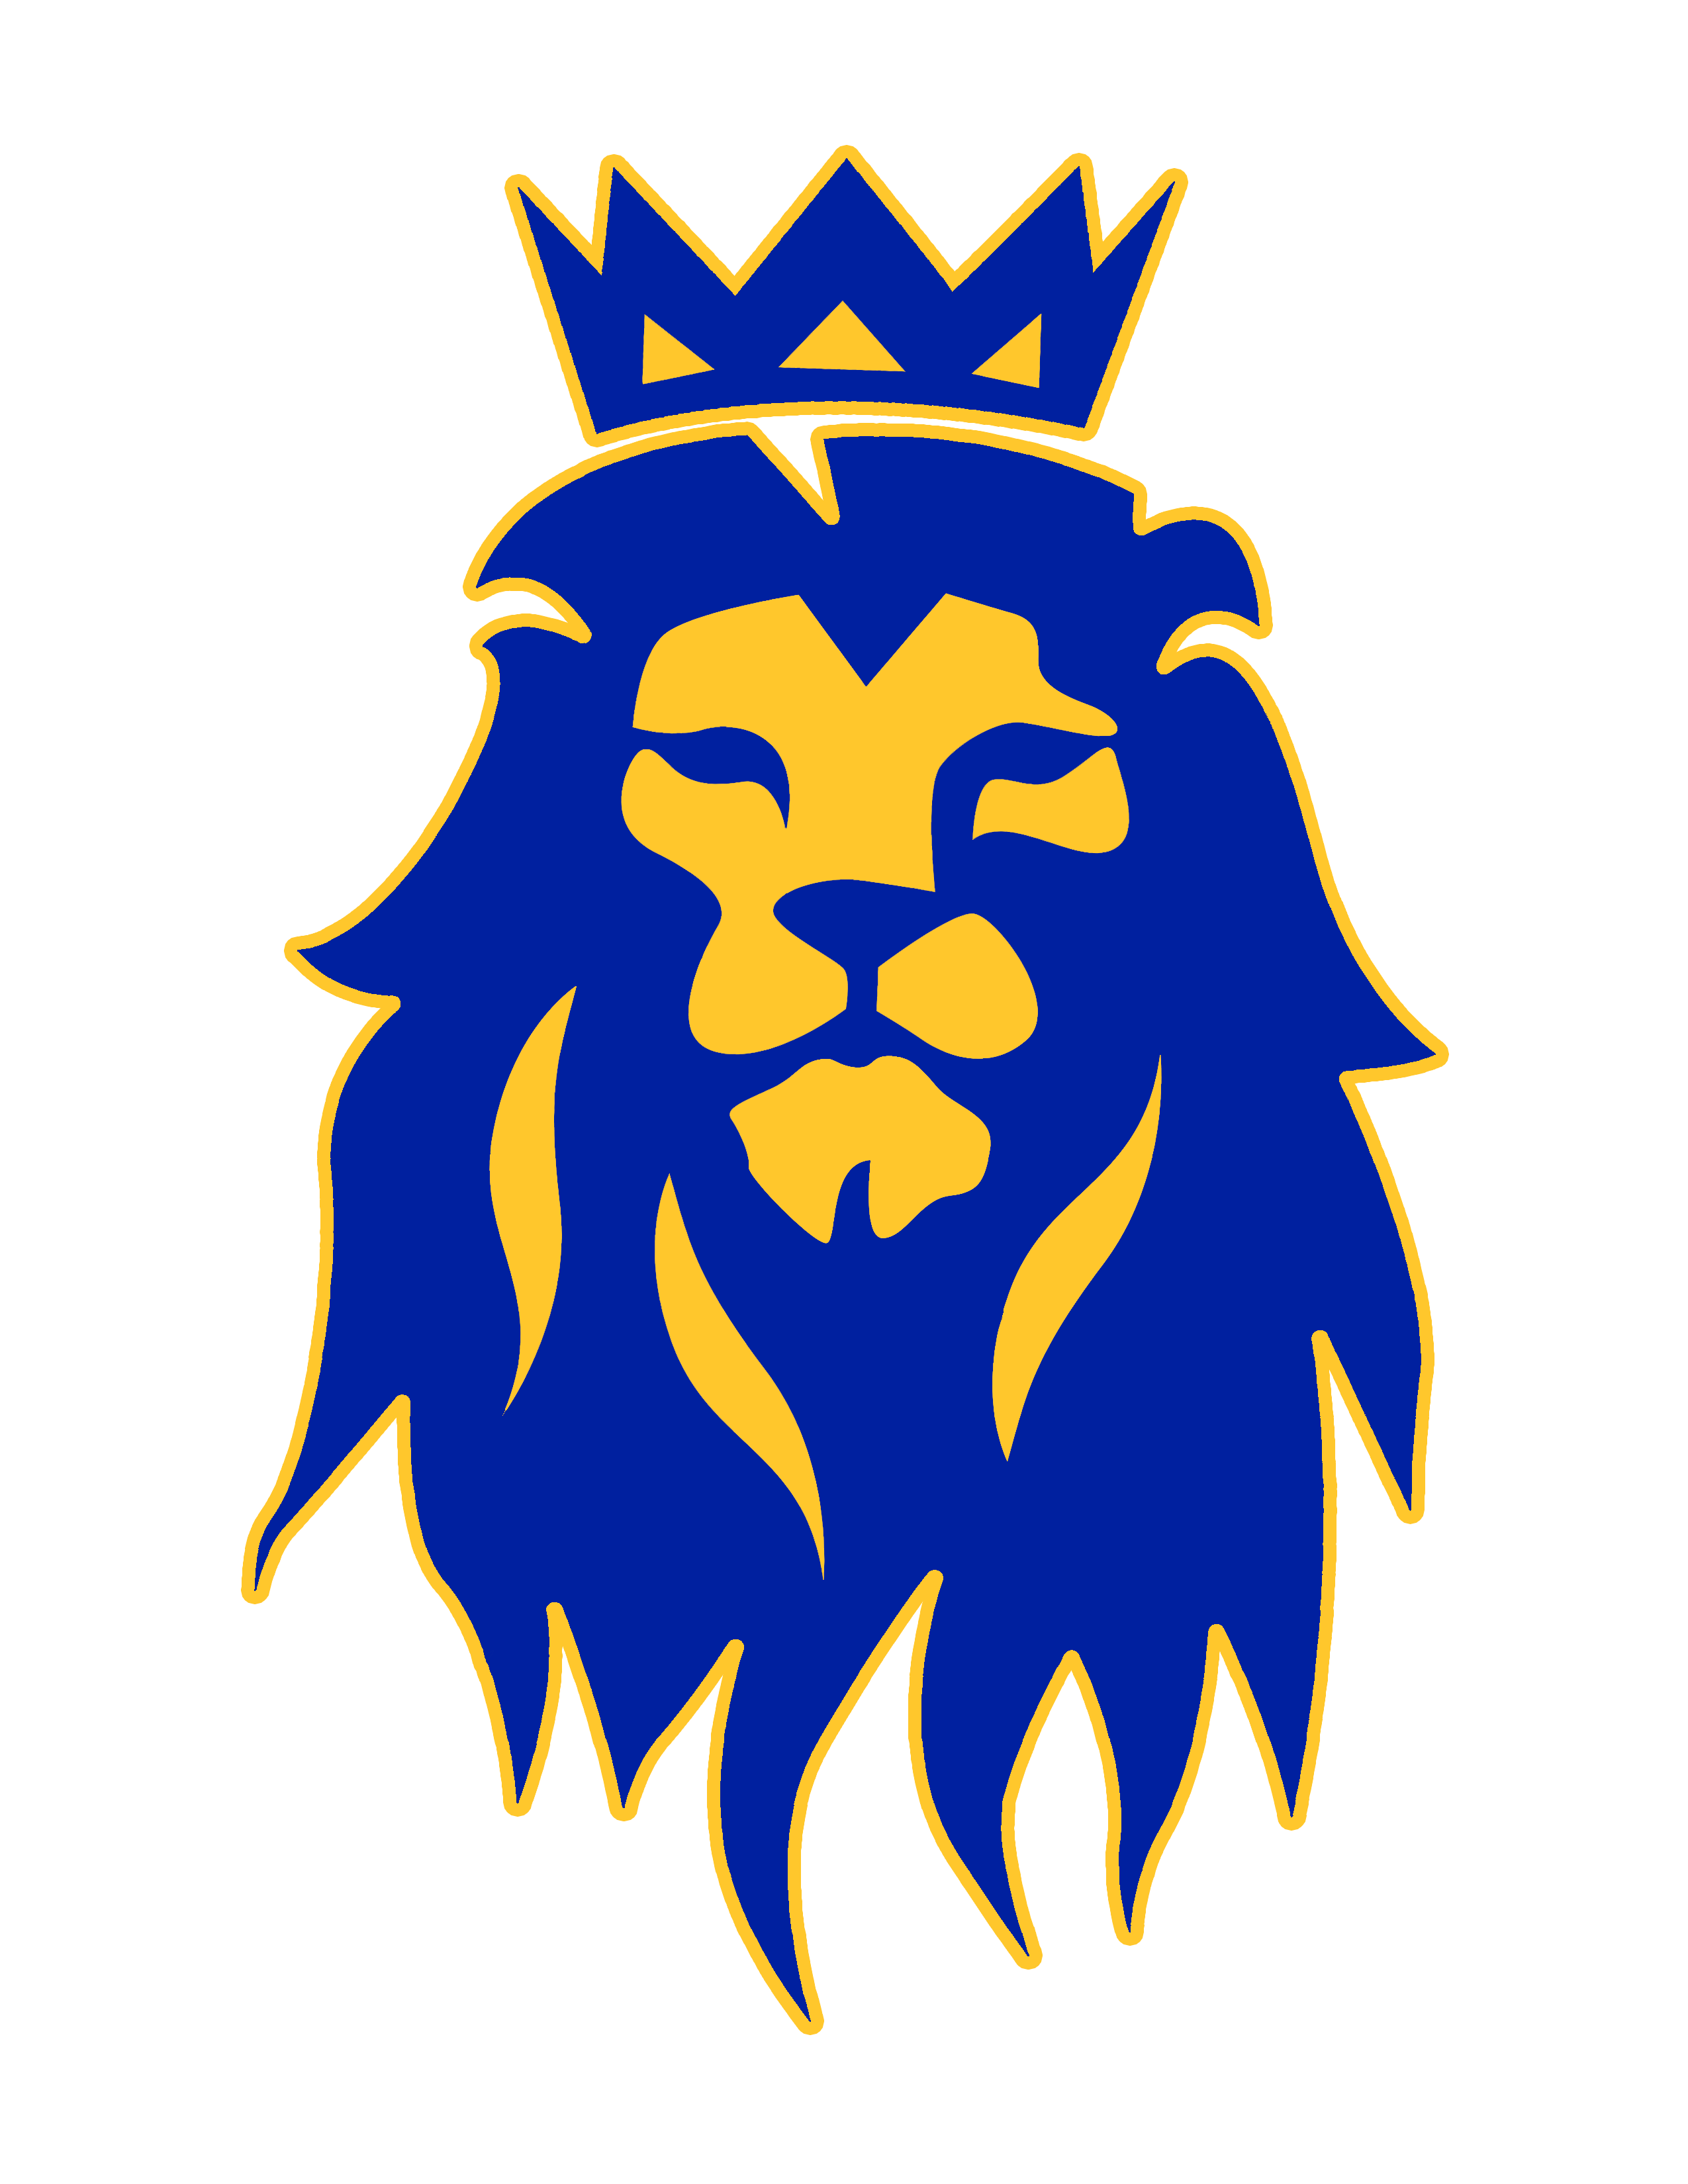 Exeter Union High School logo